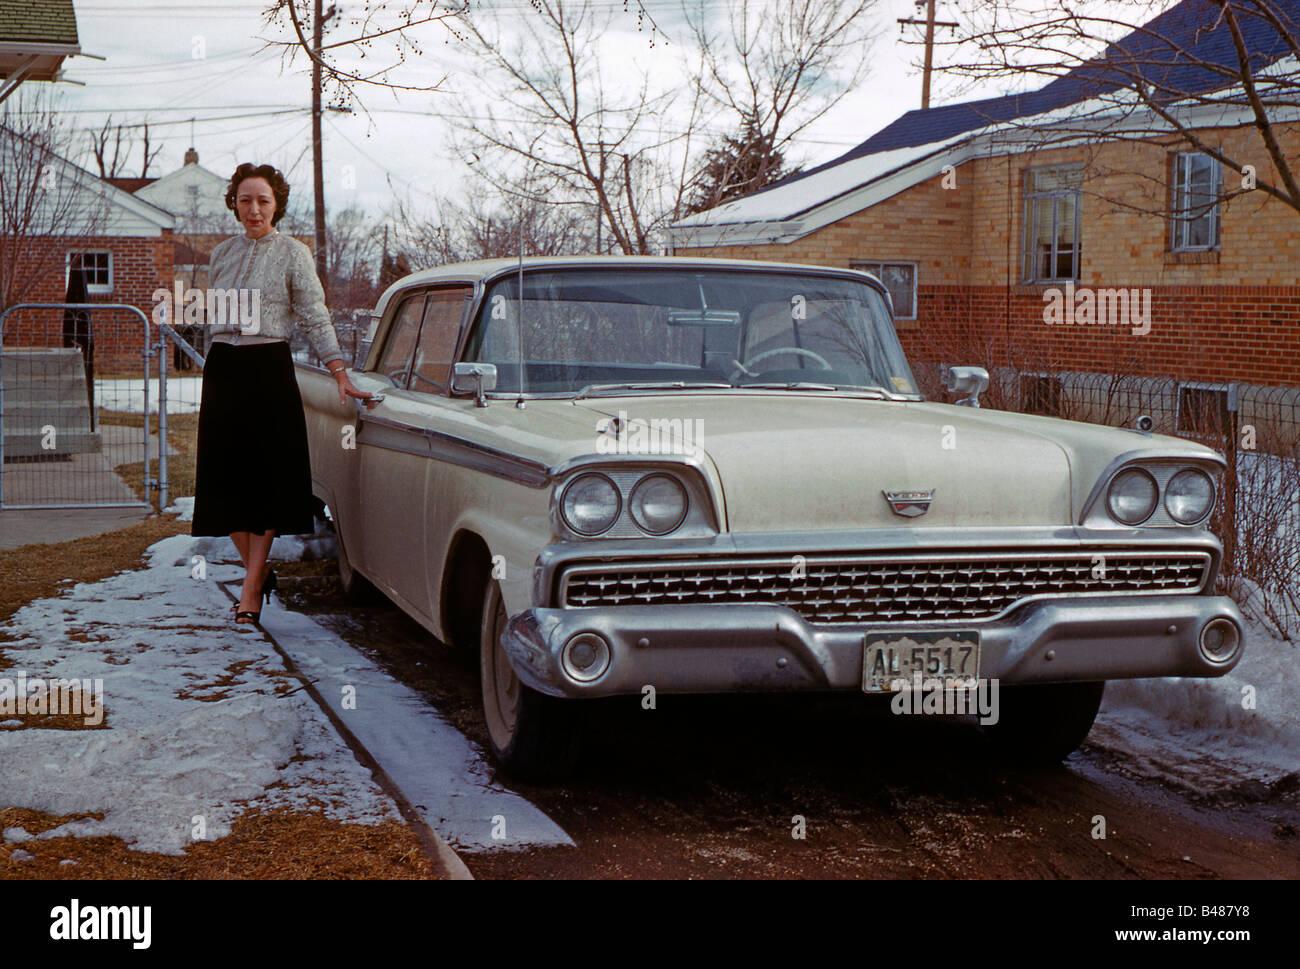 Ford Galaxie sedan 2 puertas con dueña, Colorado, USA, 1960 Imagen De Stock